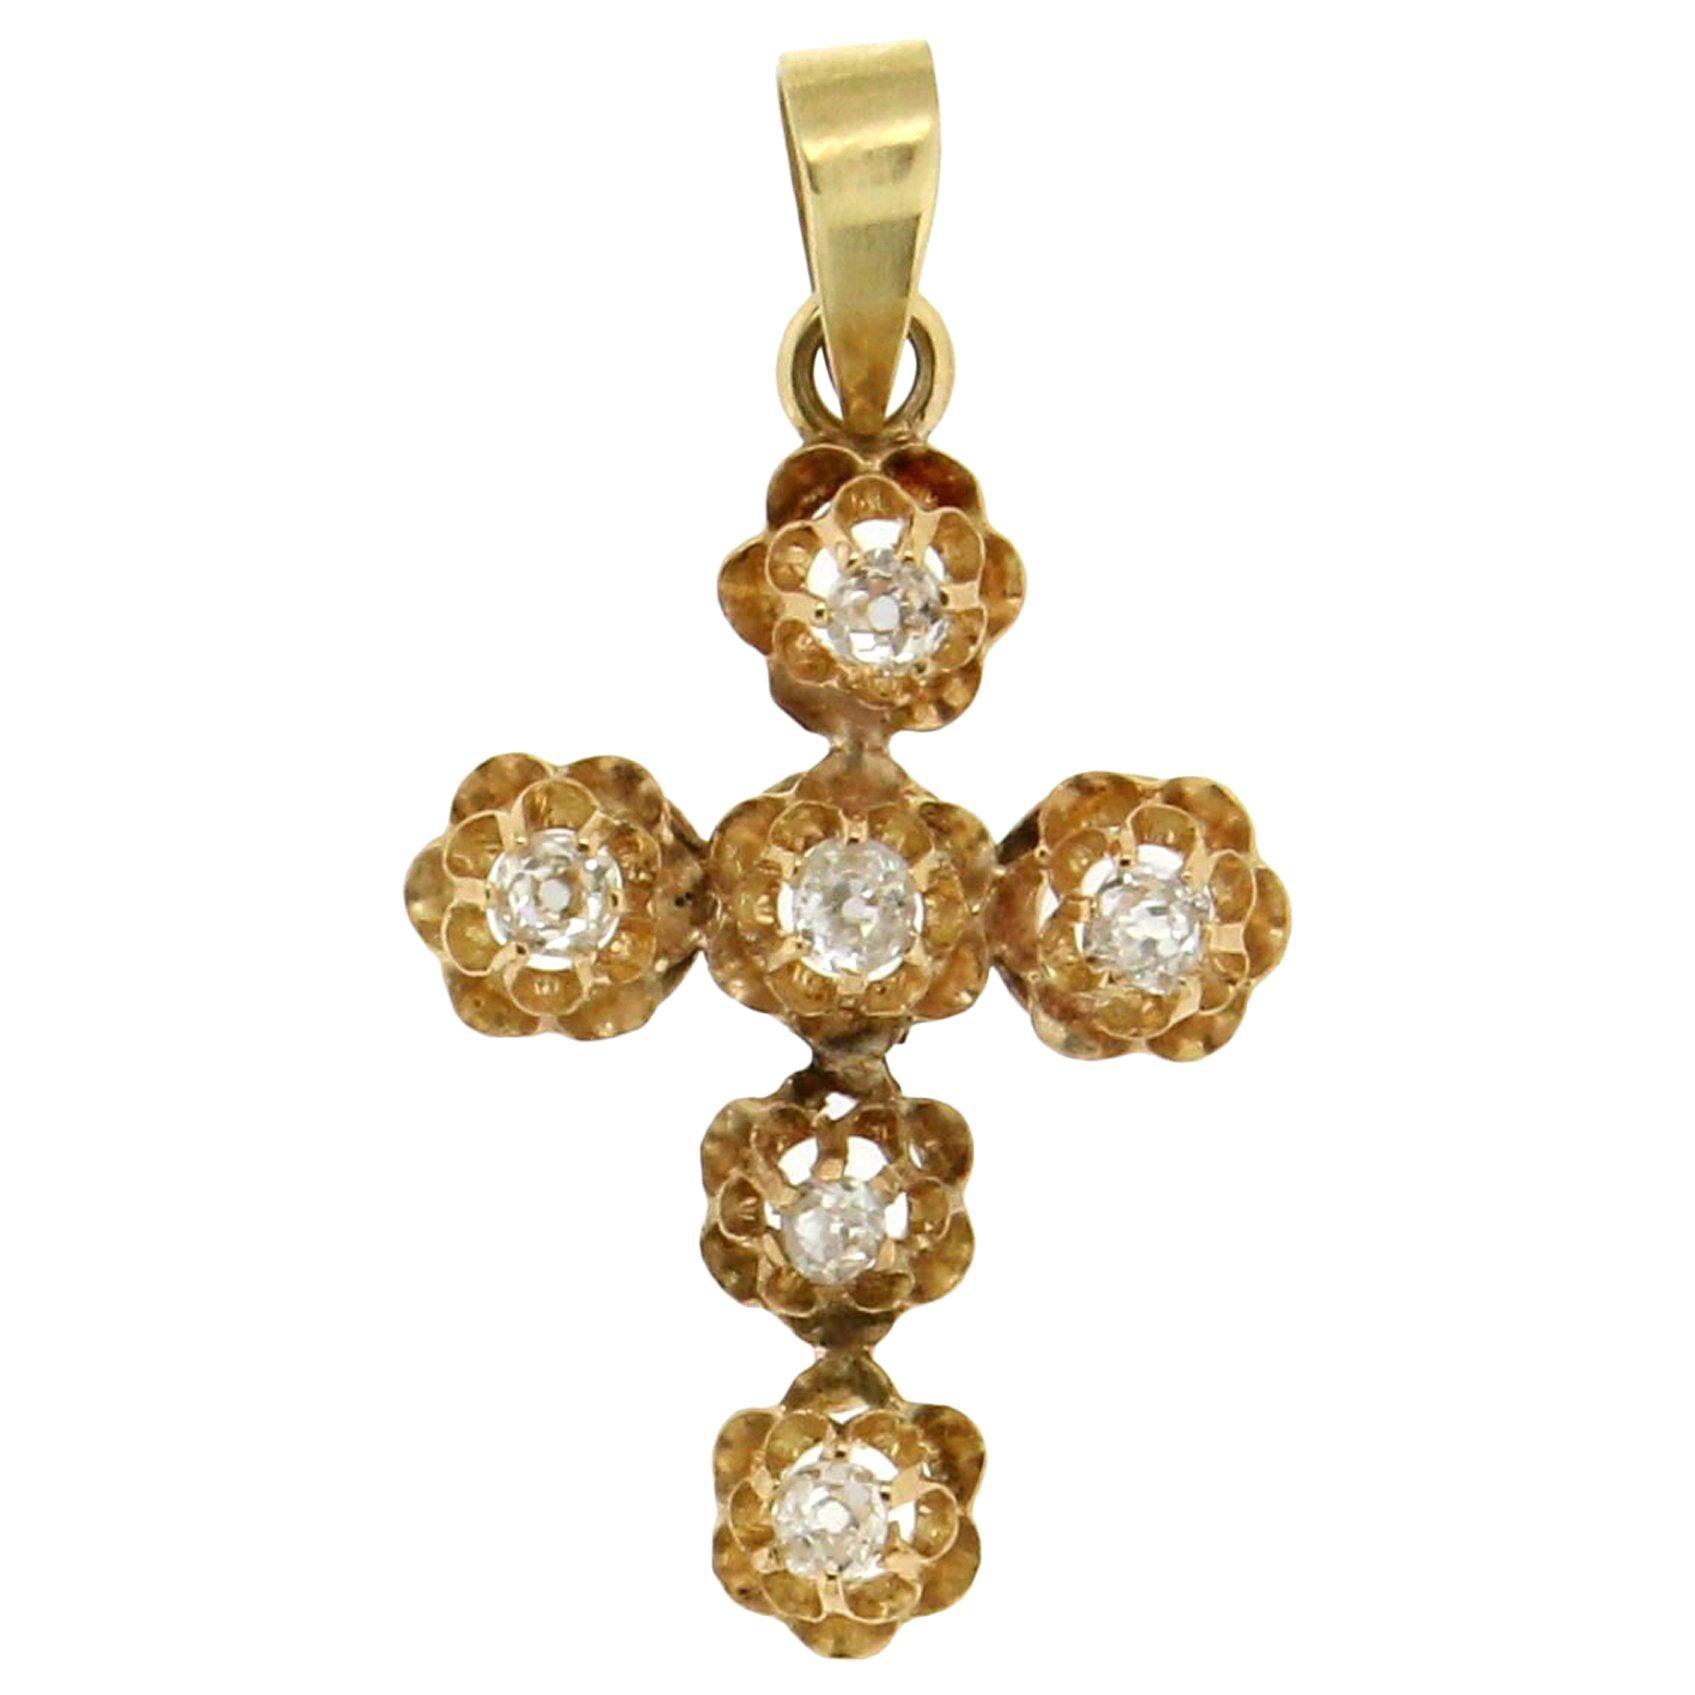 Handcraft Cross 18 Karat Yellow Gold Diamonds Pendant Necklace